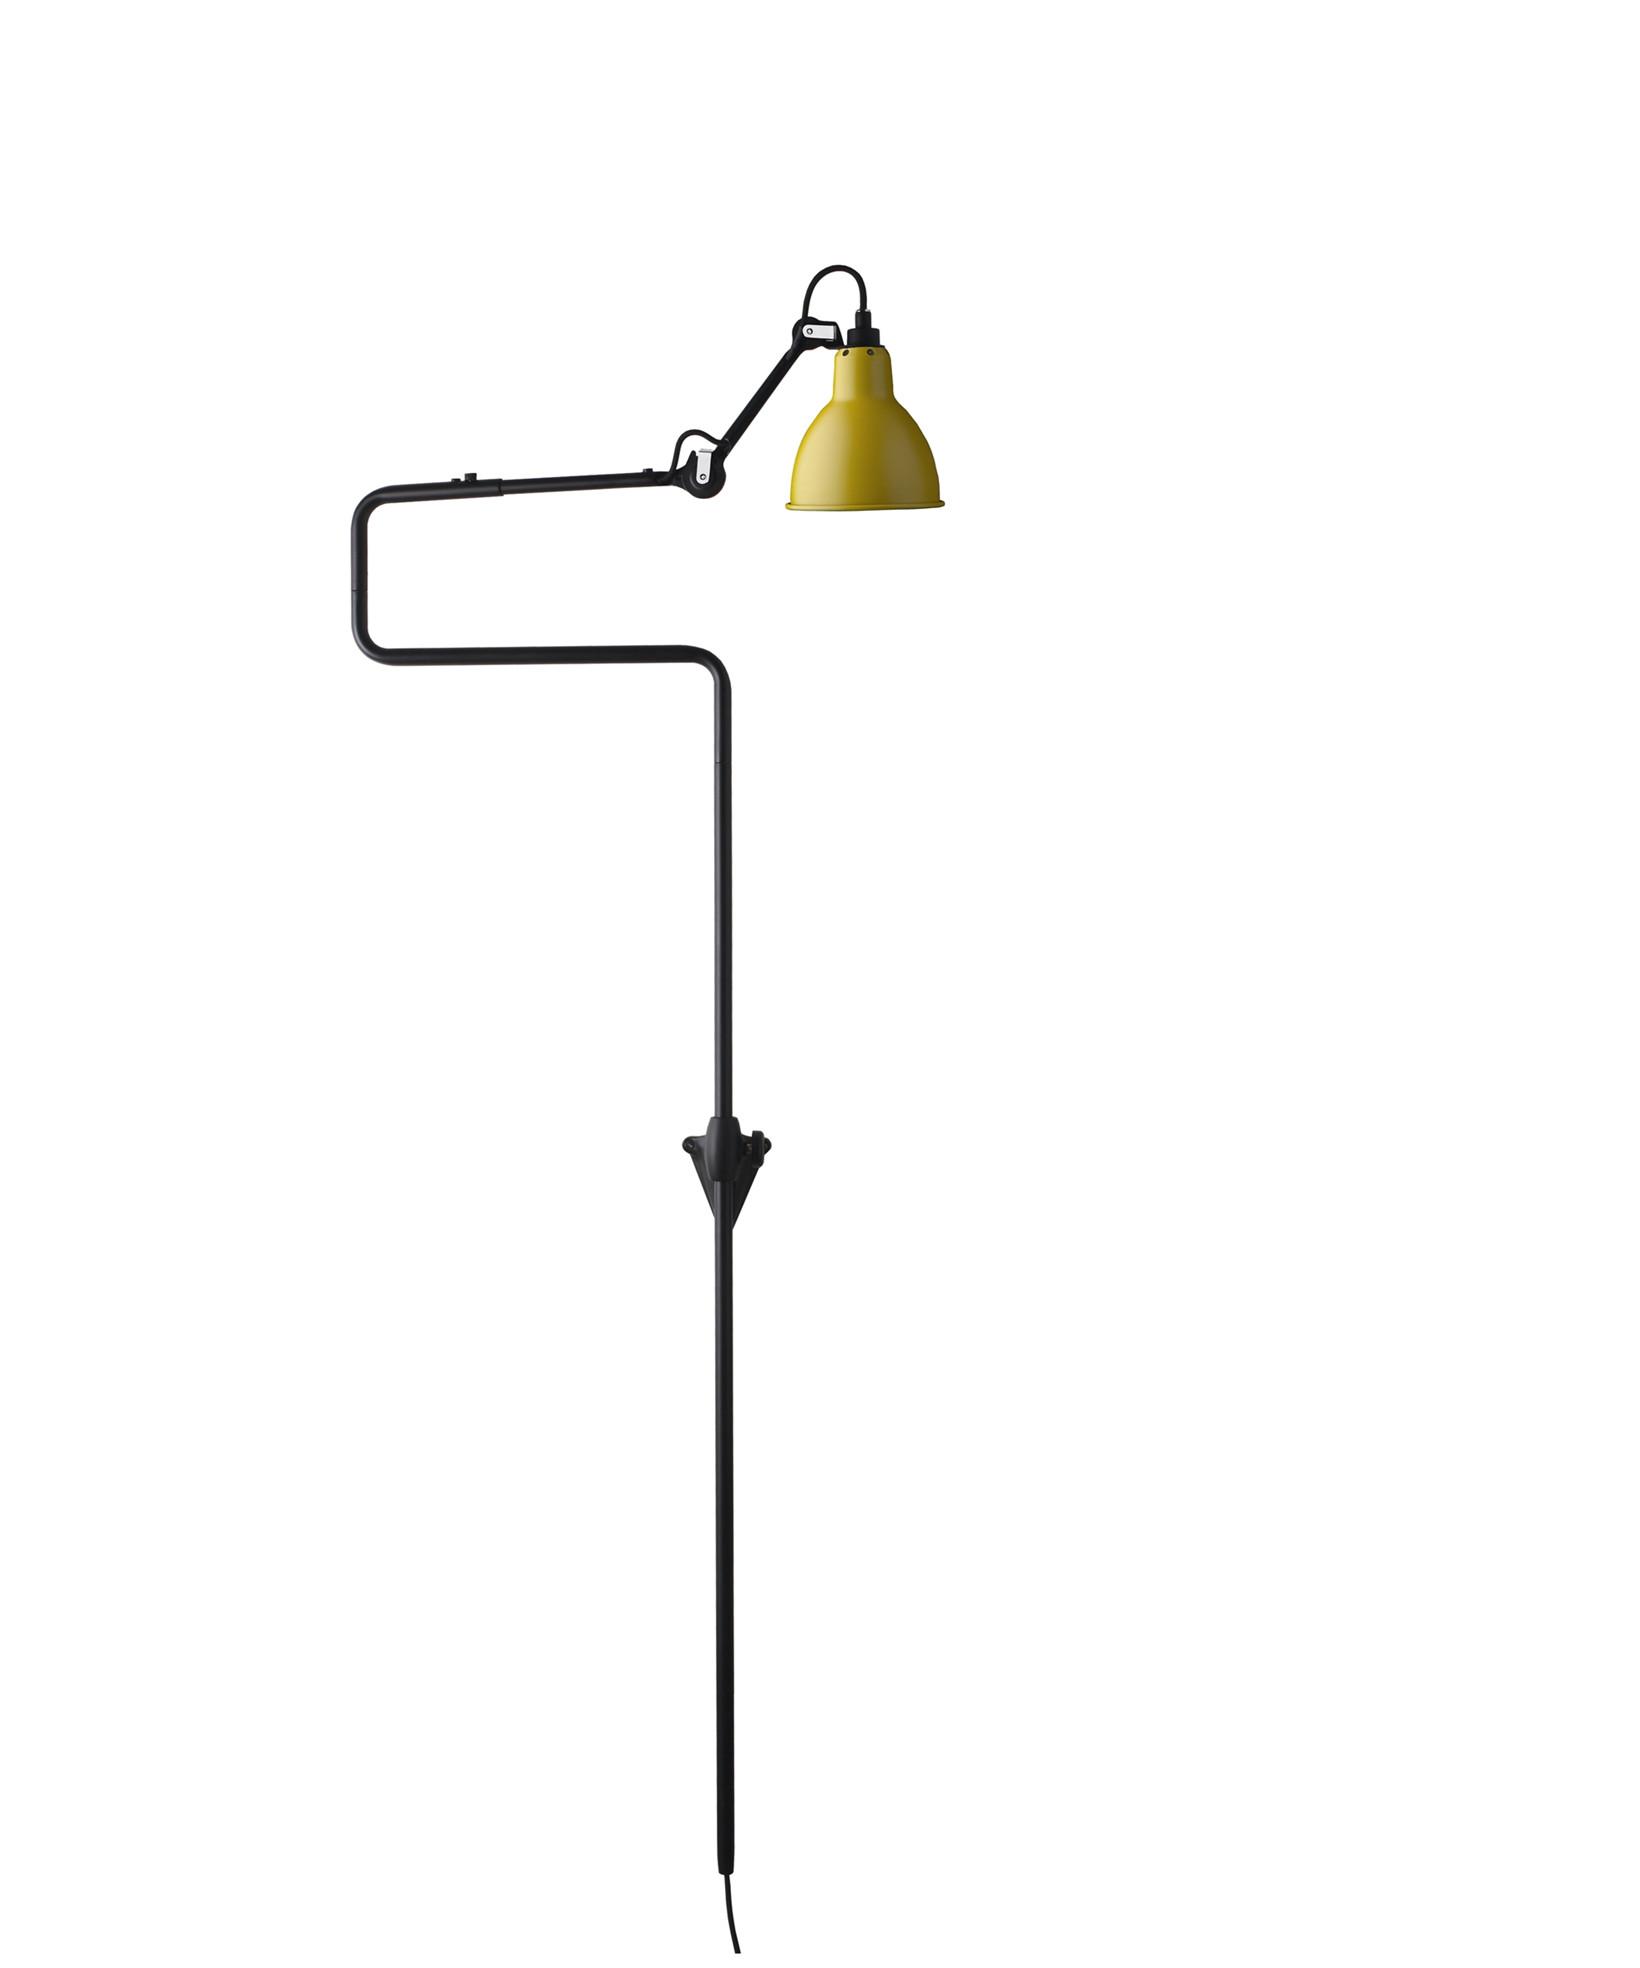 217 wandleuchte gelb lampe gras. Black Bedroom Furniture Sets. Home Design Ideas